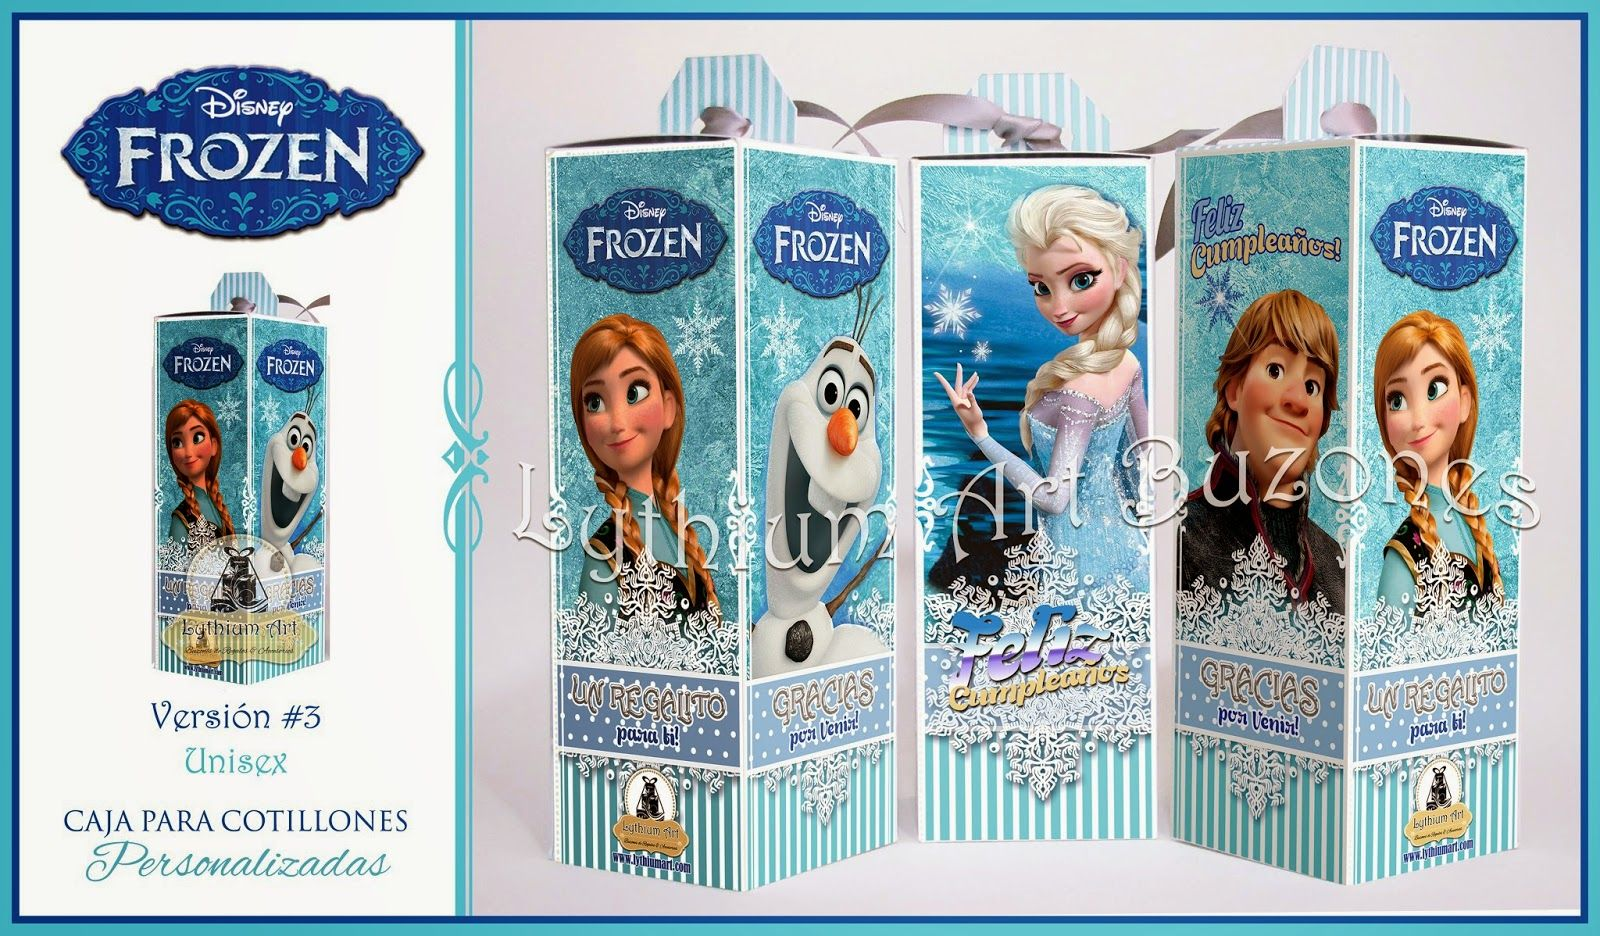 "Cajas para Cotillones Personalizadas ""Frozen"" | Lythium Art® Design by: Yil Siritt"